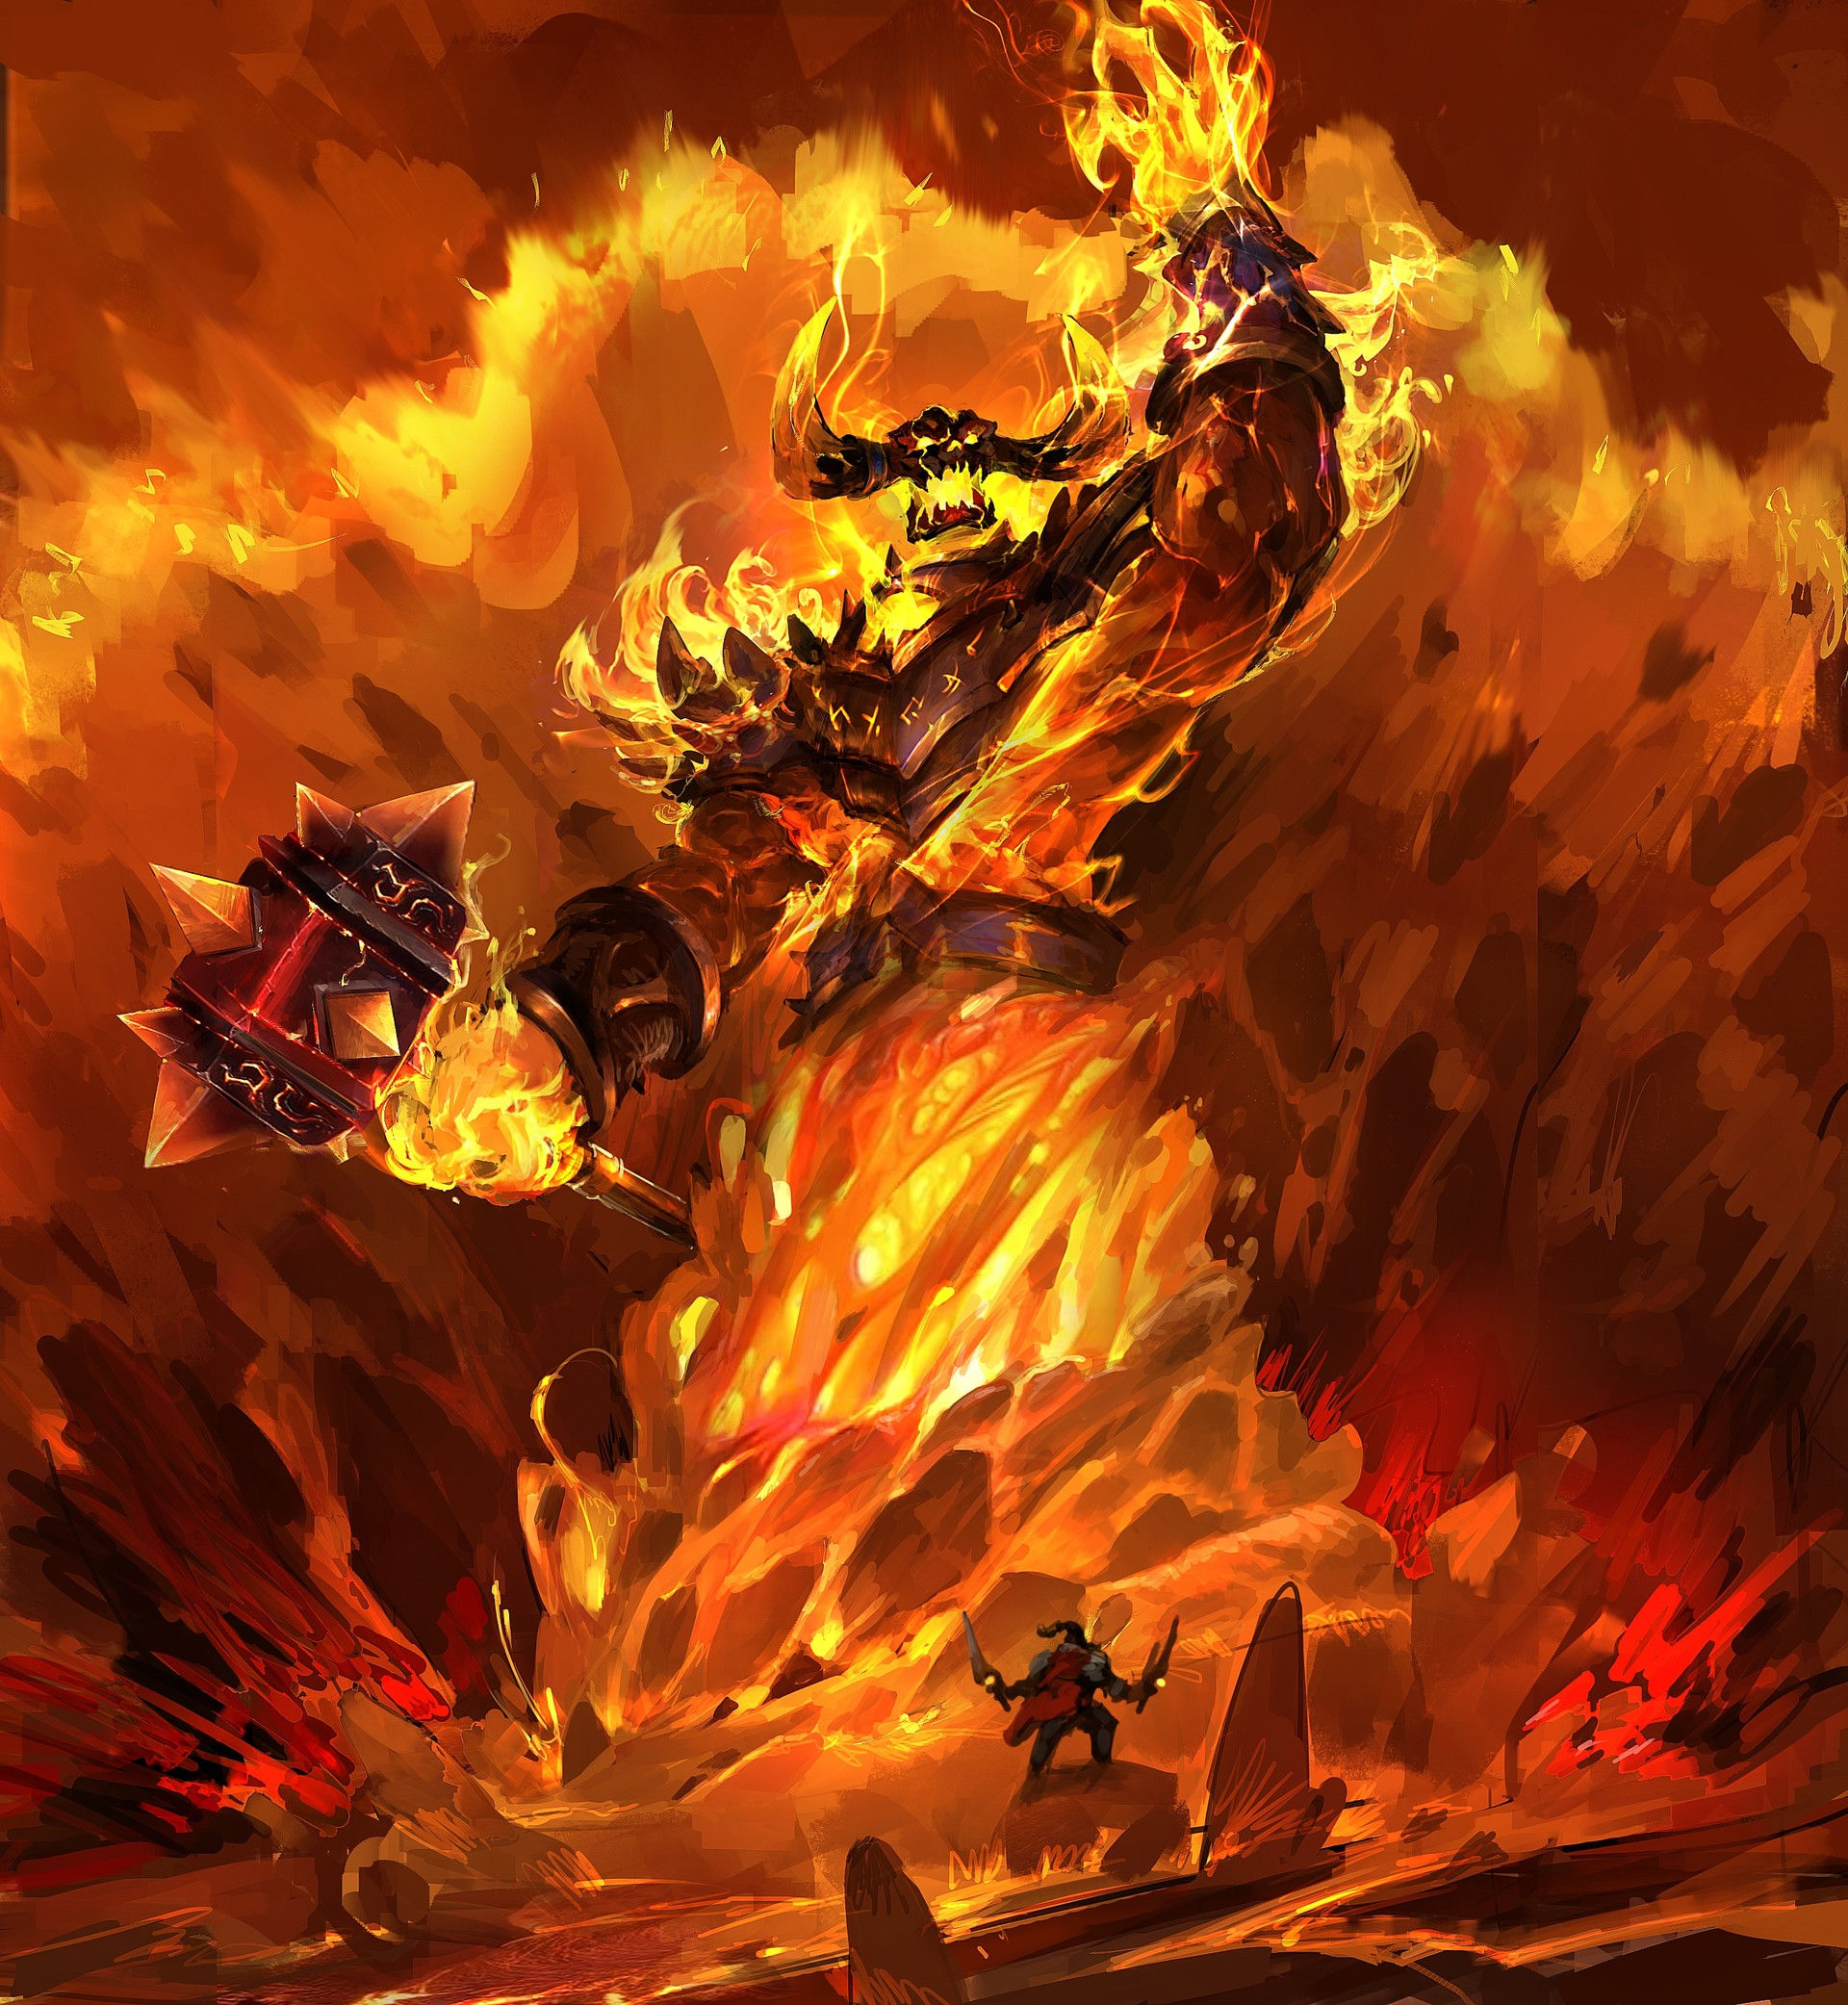 Car Art Wallpaper Artstation Ragnaros The Firelord Dante Liu